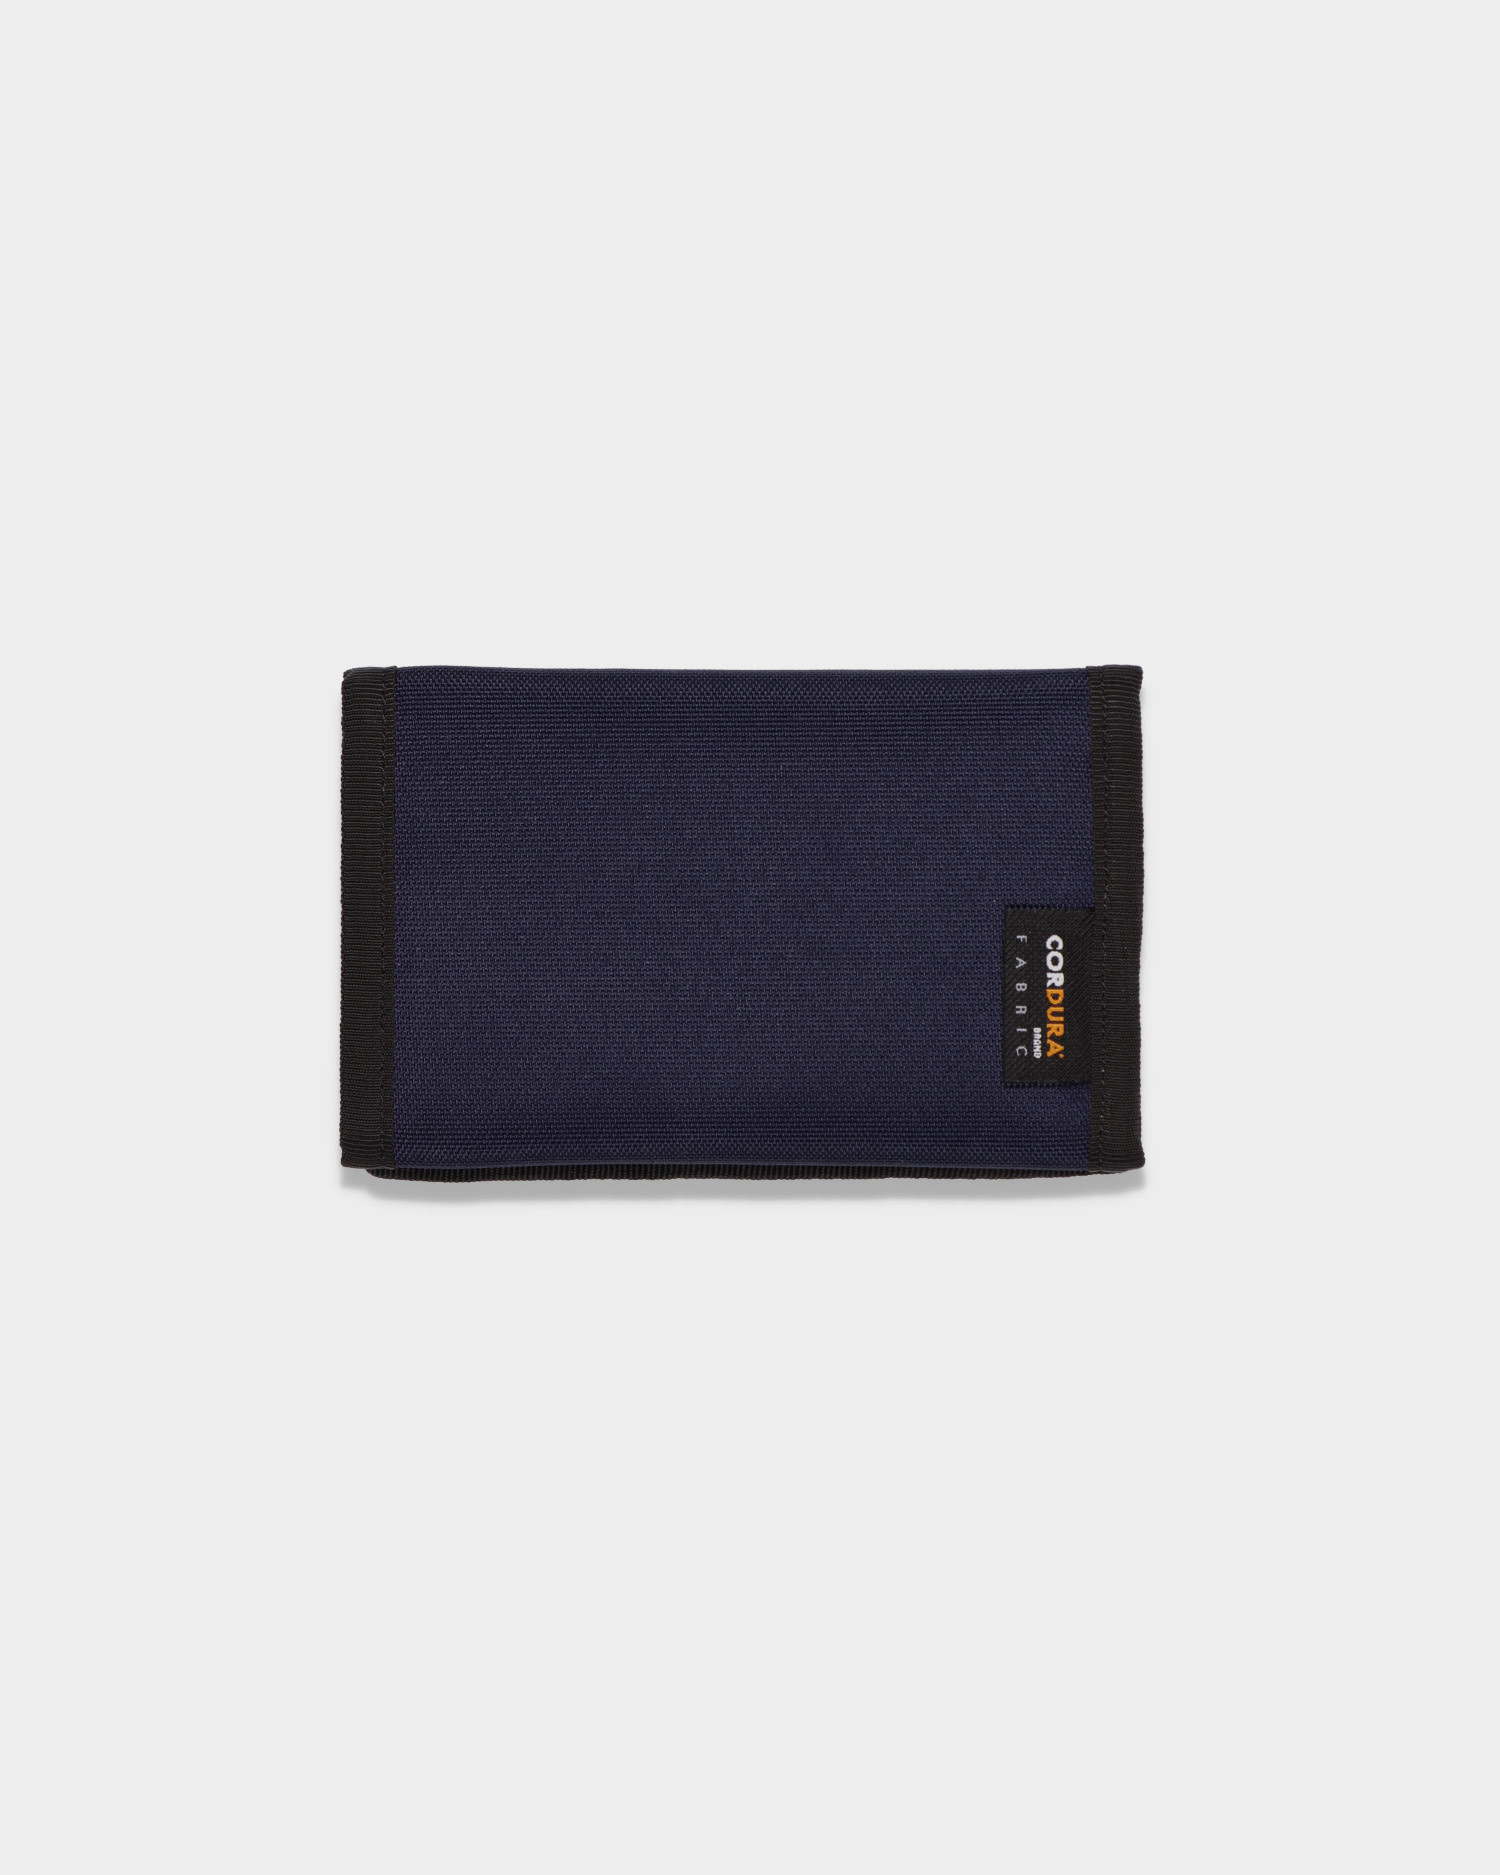 Carhartt Payton Wallet Space/White